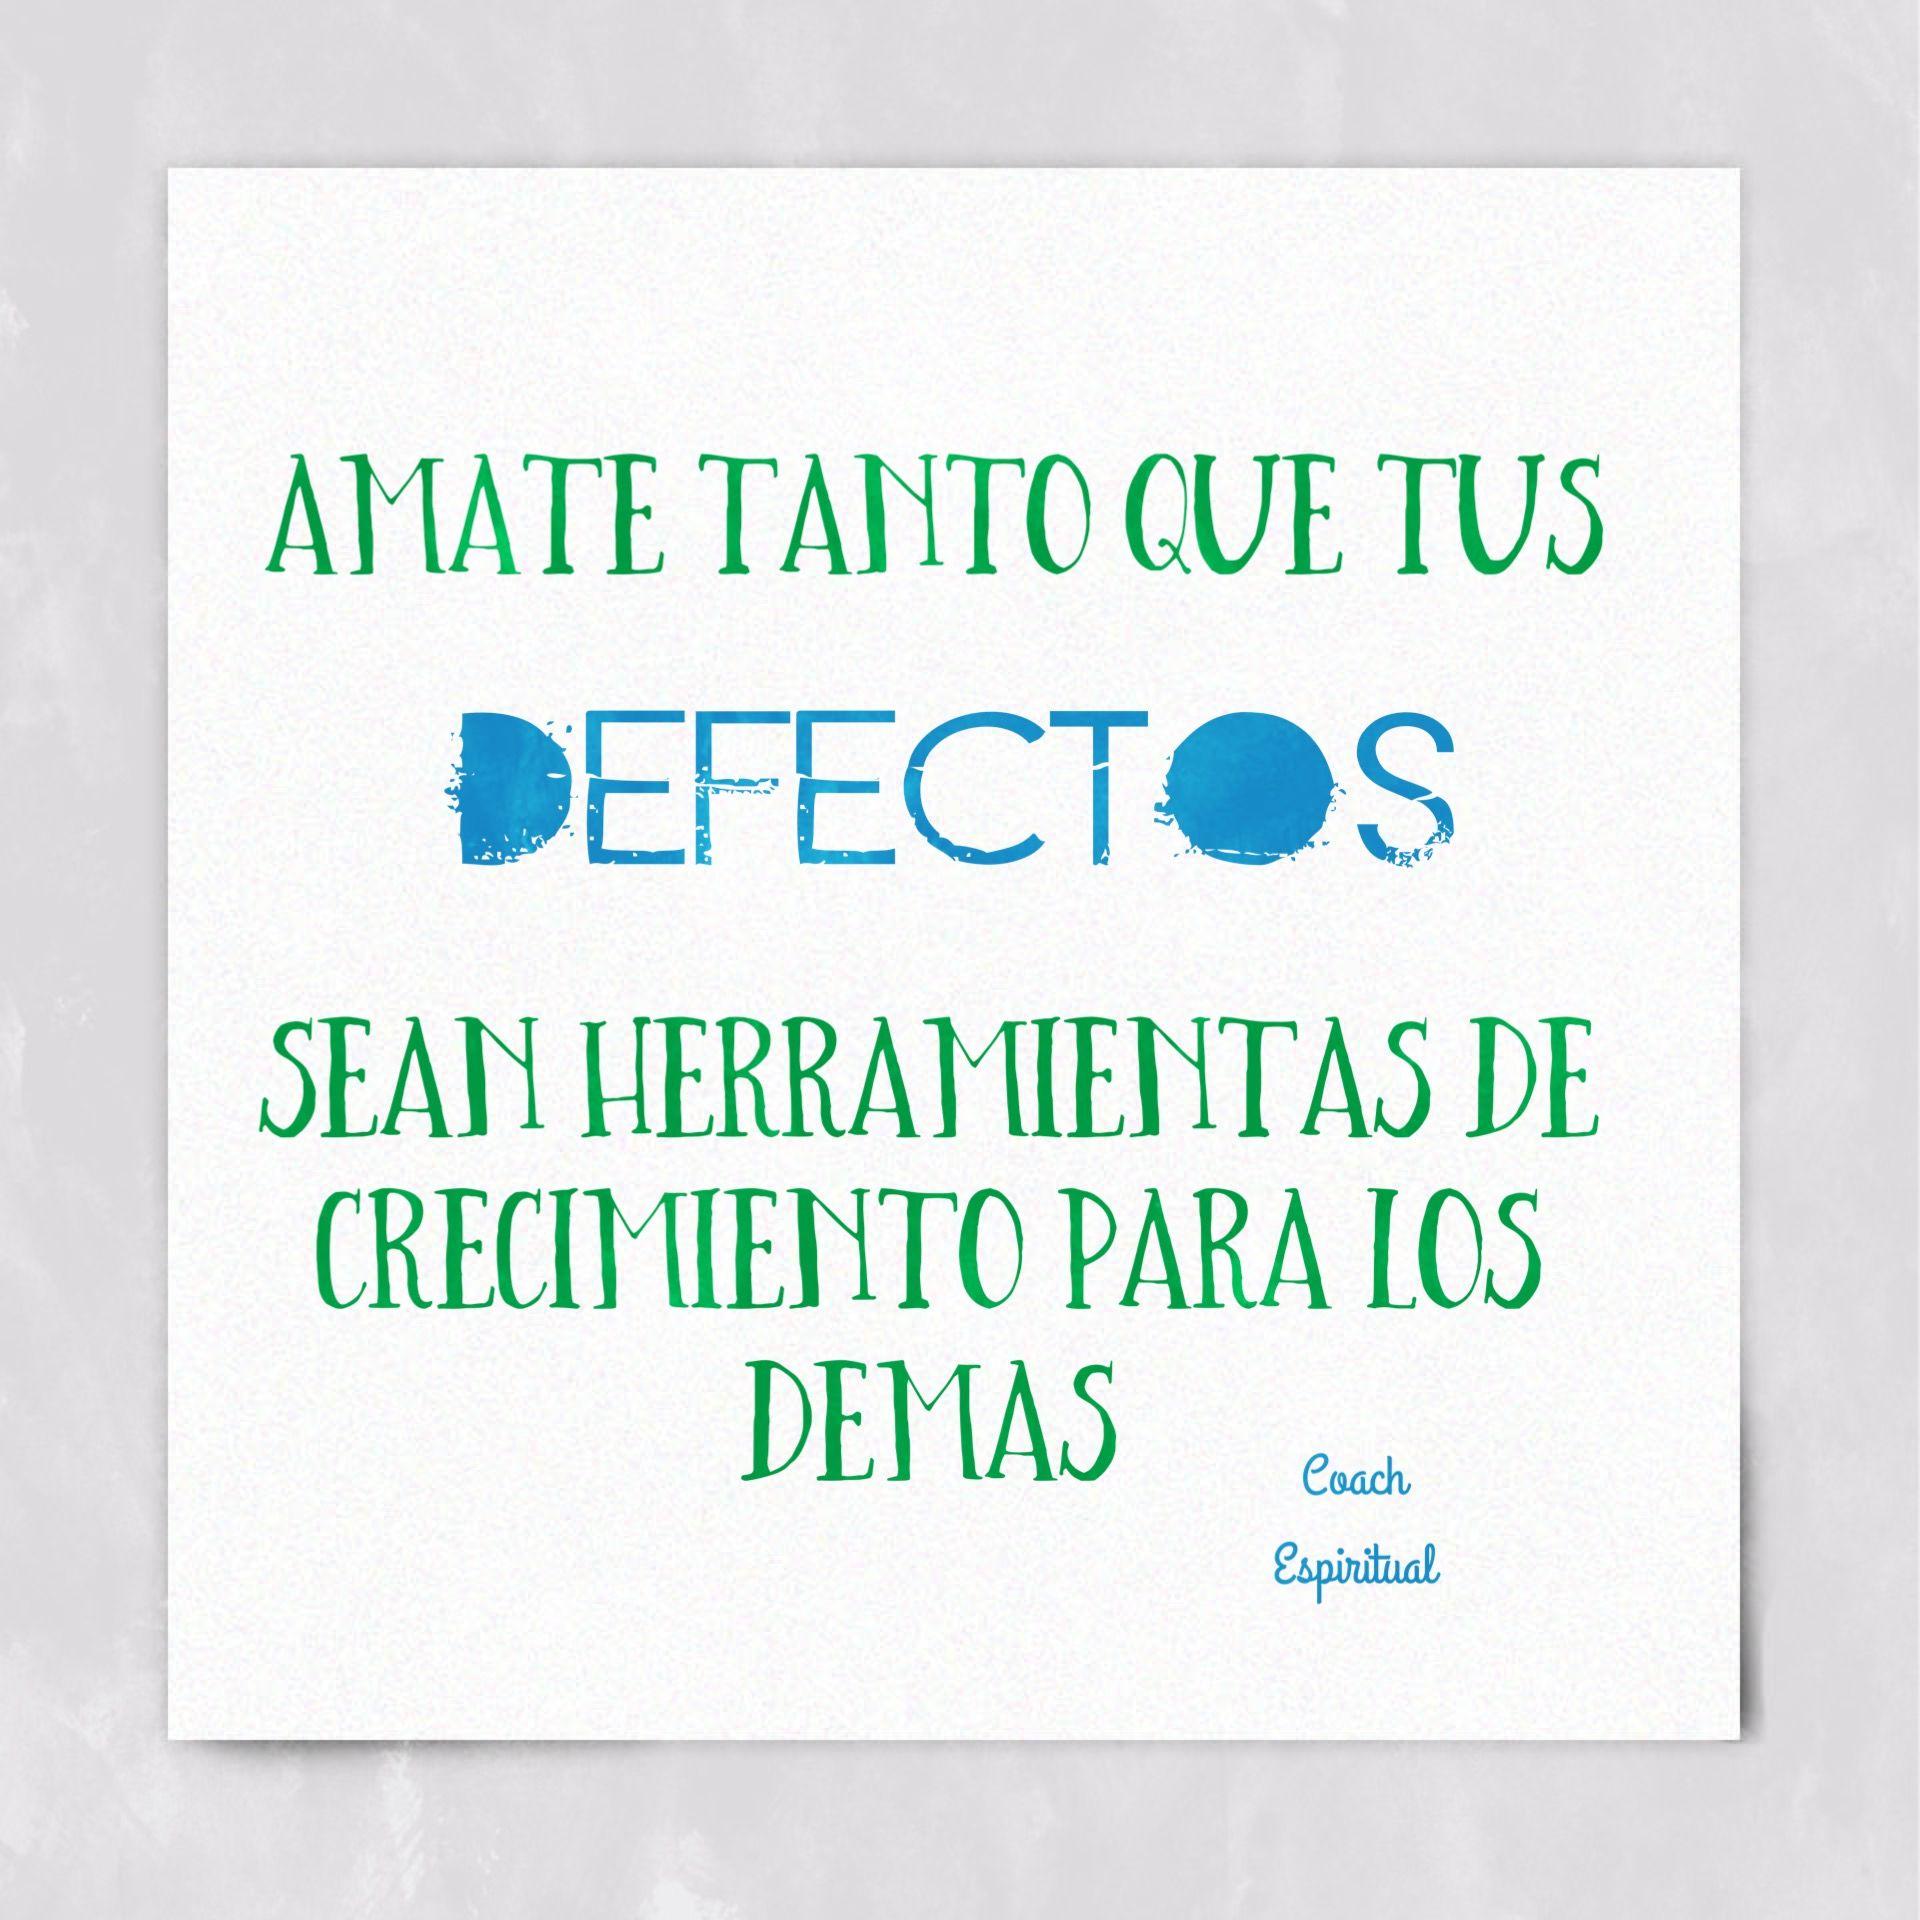 #frases #positivas #coachespiritual #autoestima